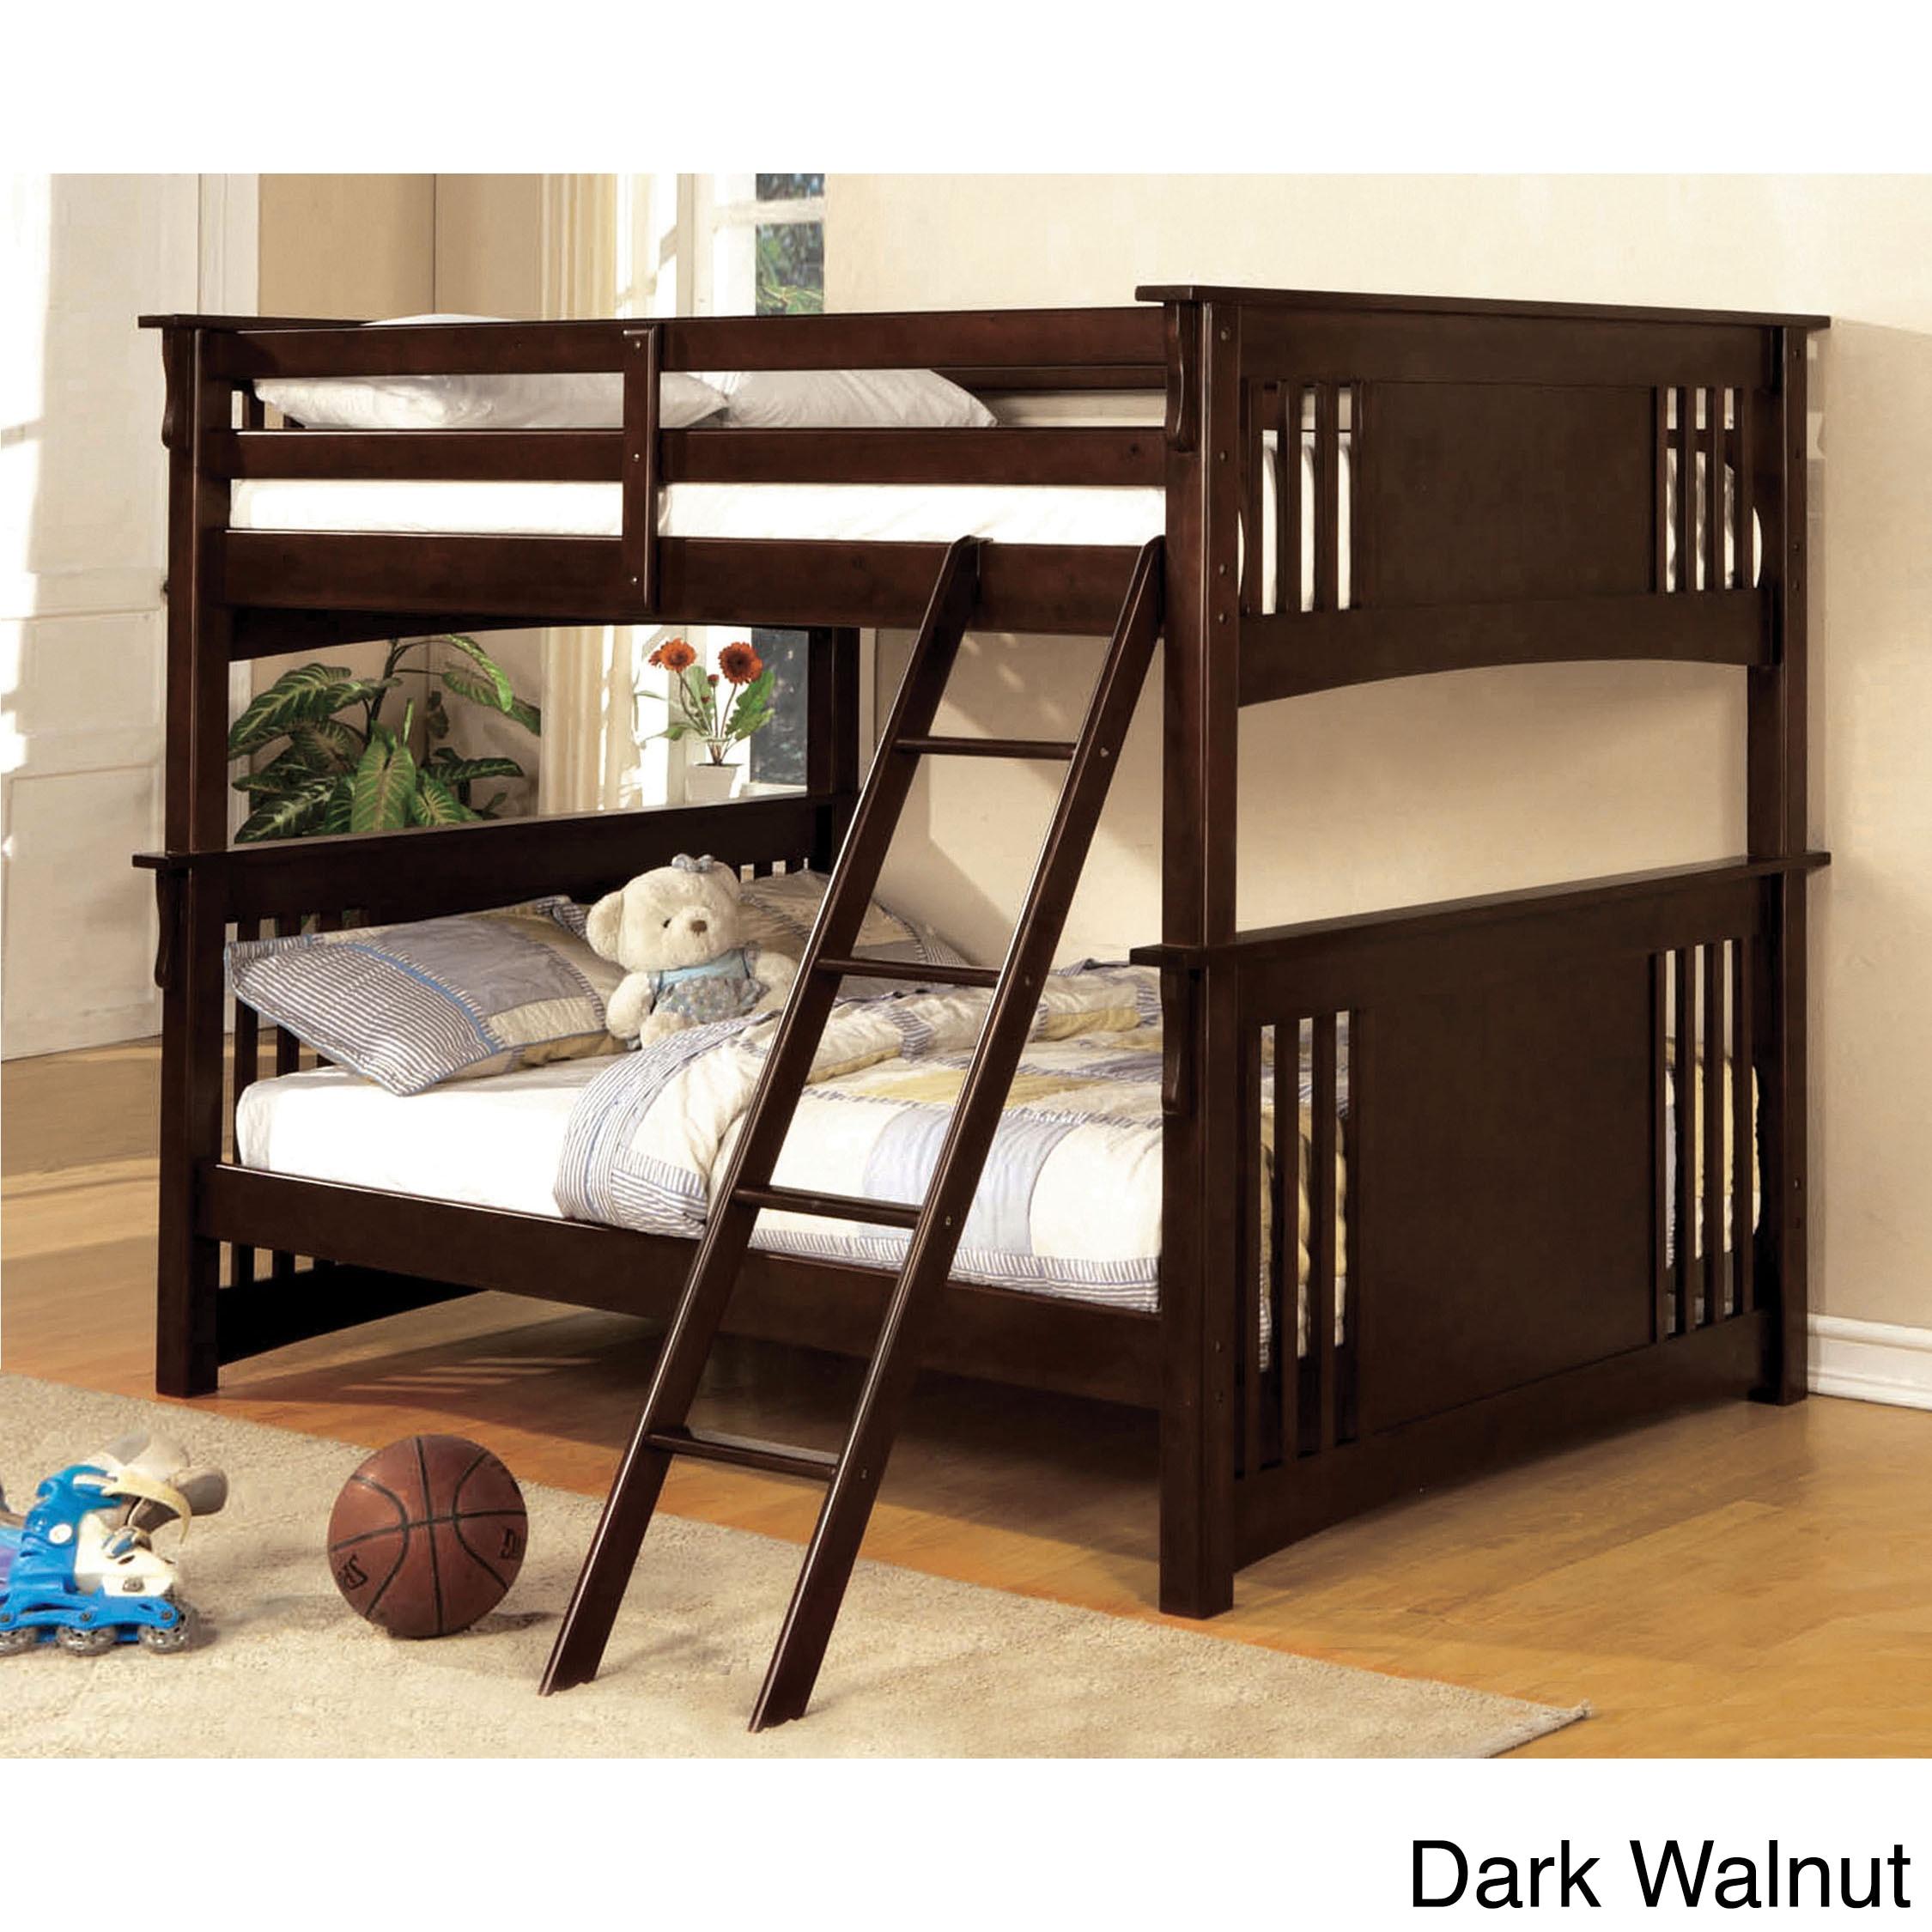 Furniture of America Ashton Youth Full over Full Bunk Bed...